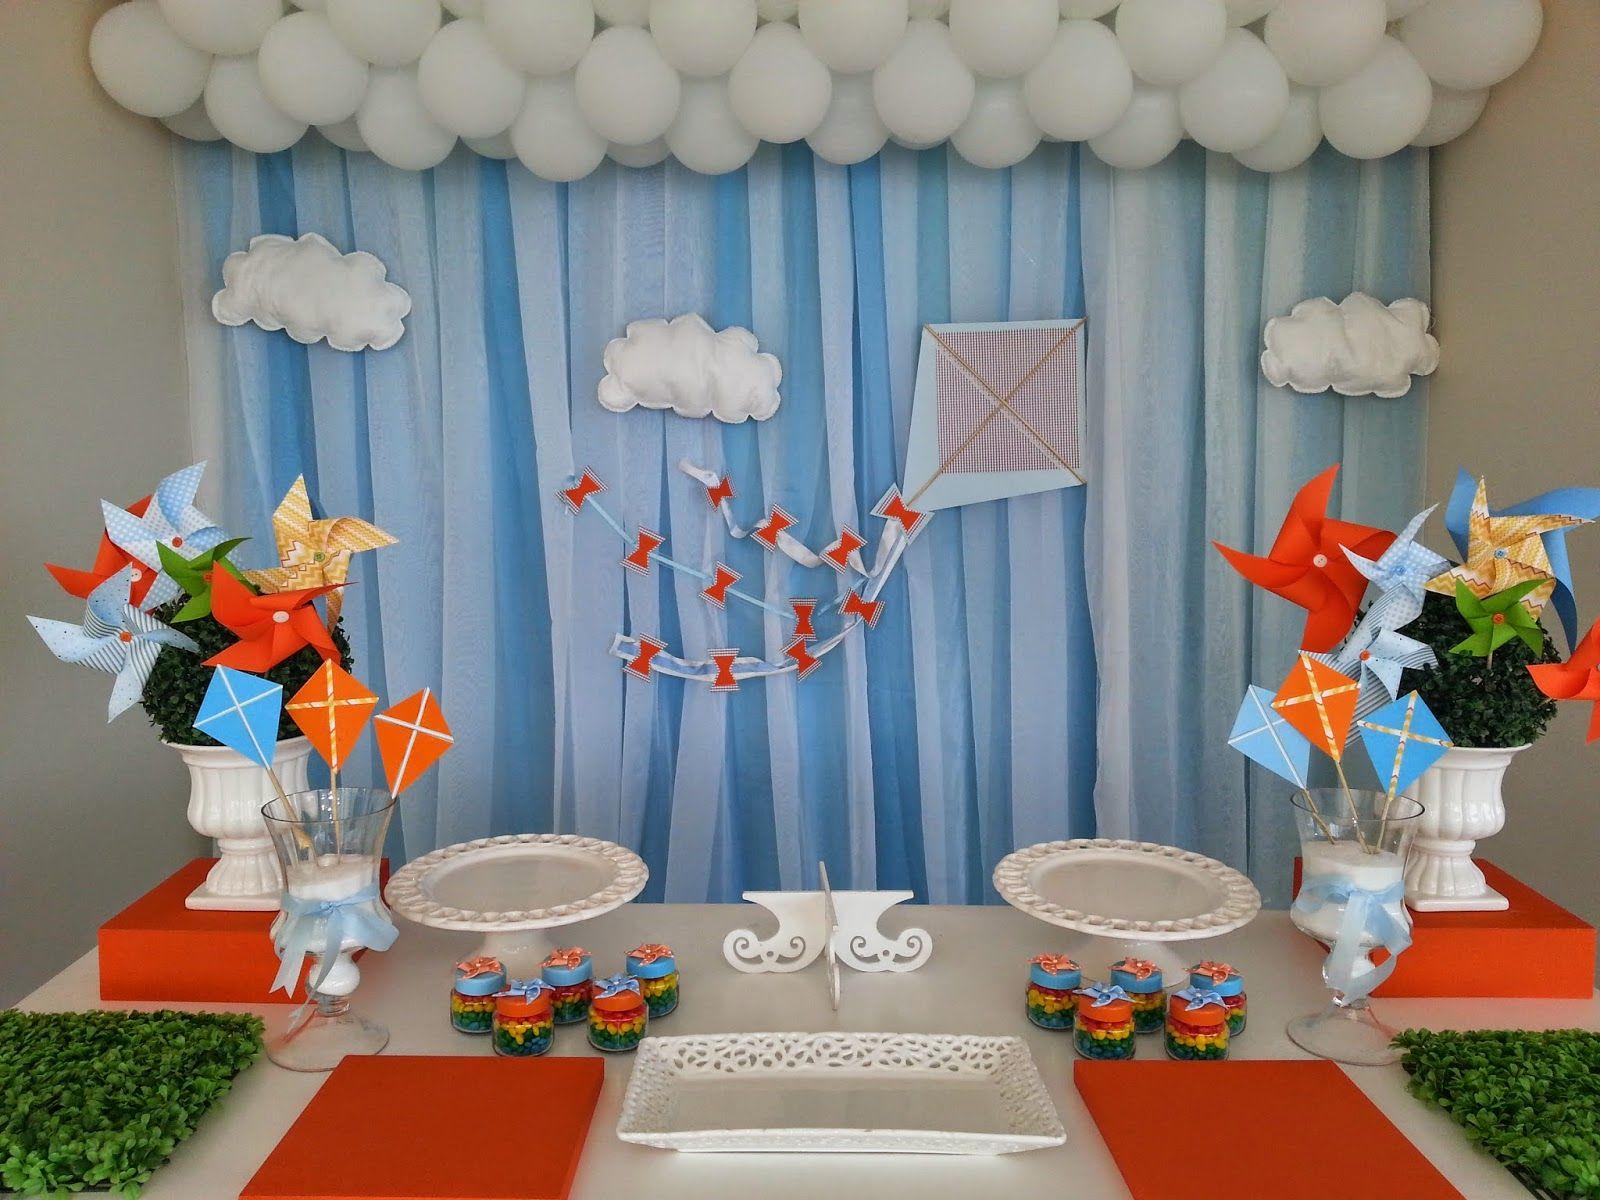 Momento nico decora o de festas infantis pipas e for Tablero del deco del sitio del bebe